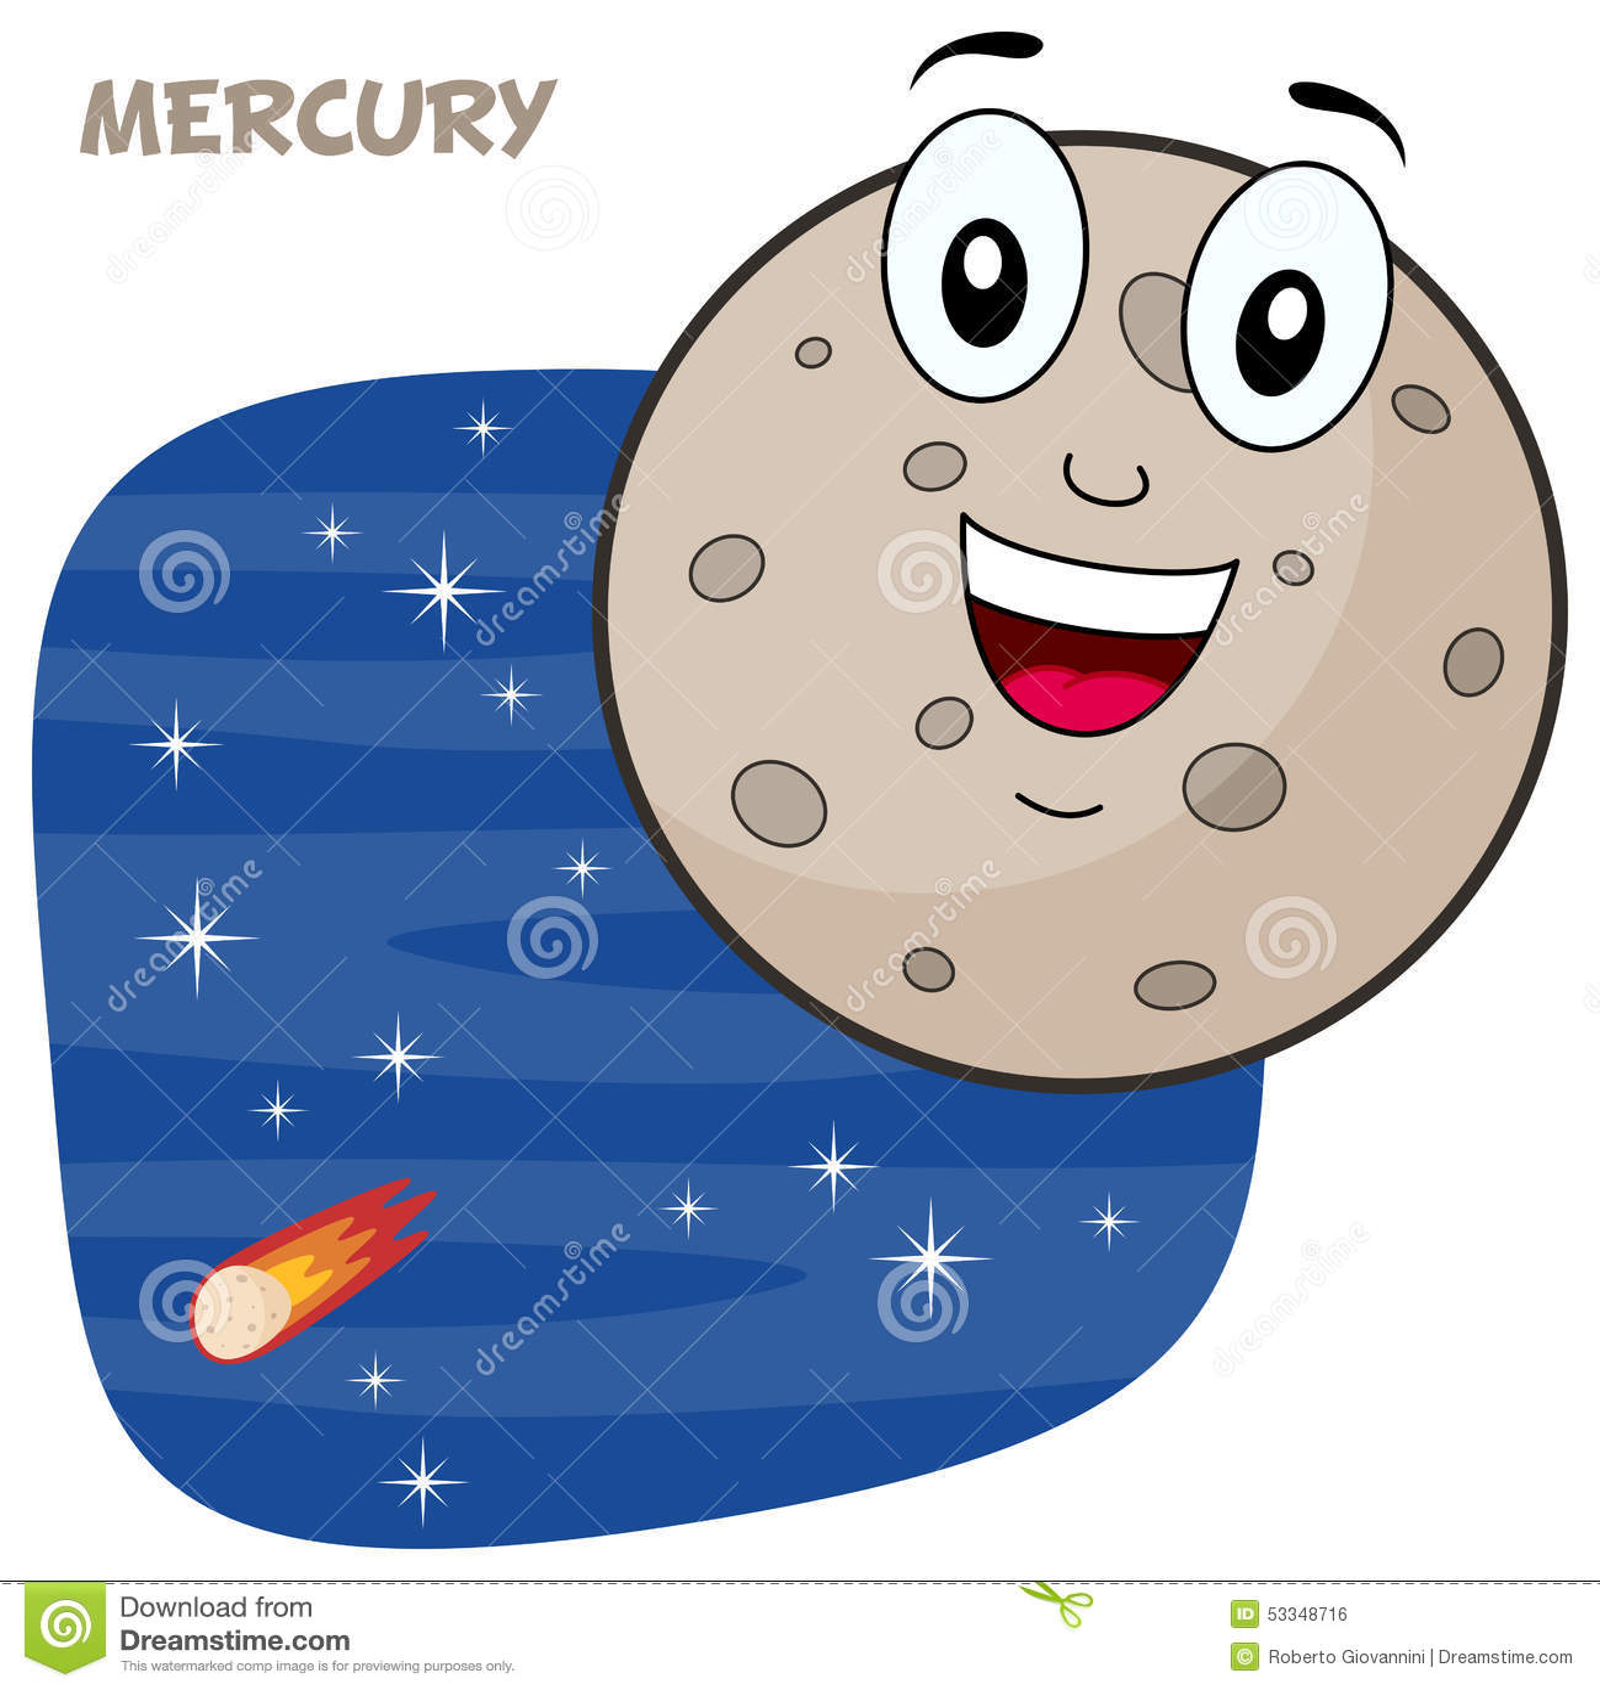 Cartoon Mercury Planet Character Stock Vector - Image ...